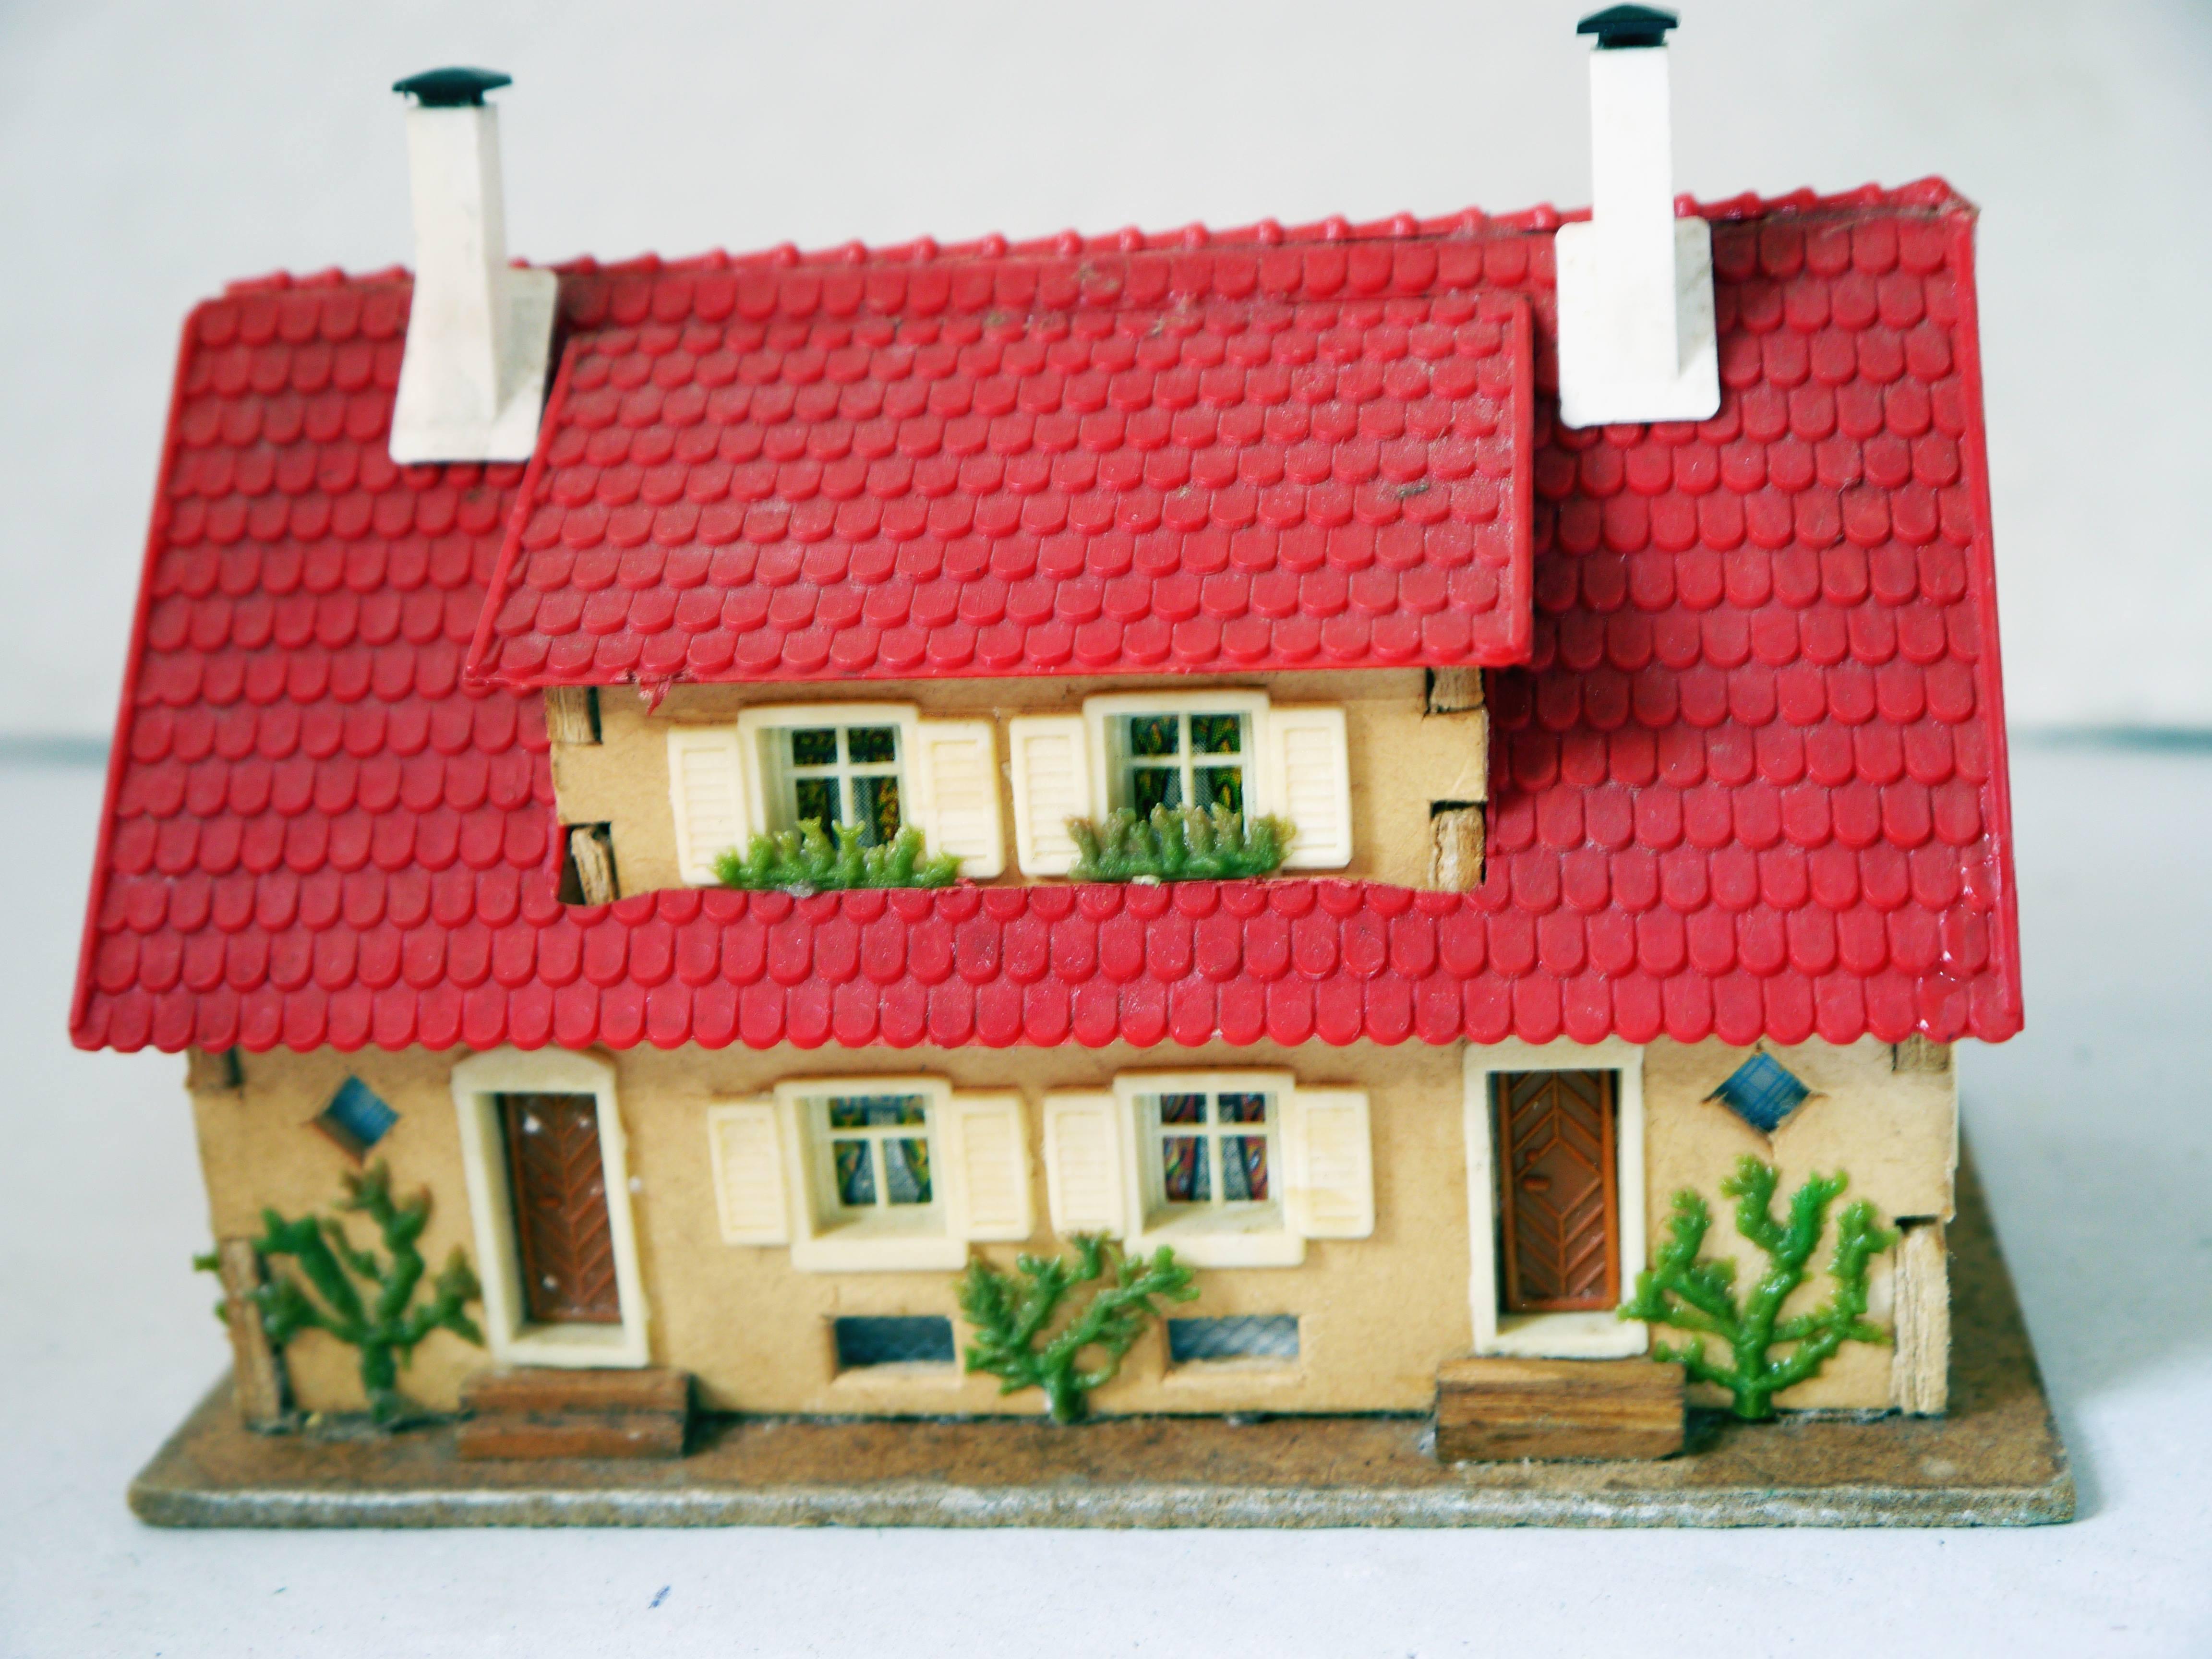 faller h0 wohnhaus aus holz ebay. Black Bedroom Furniture Sets. Home Design Ideas